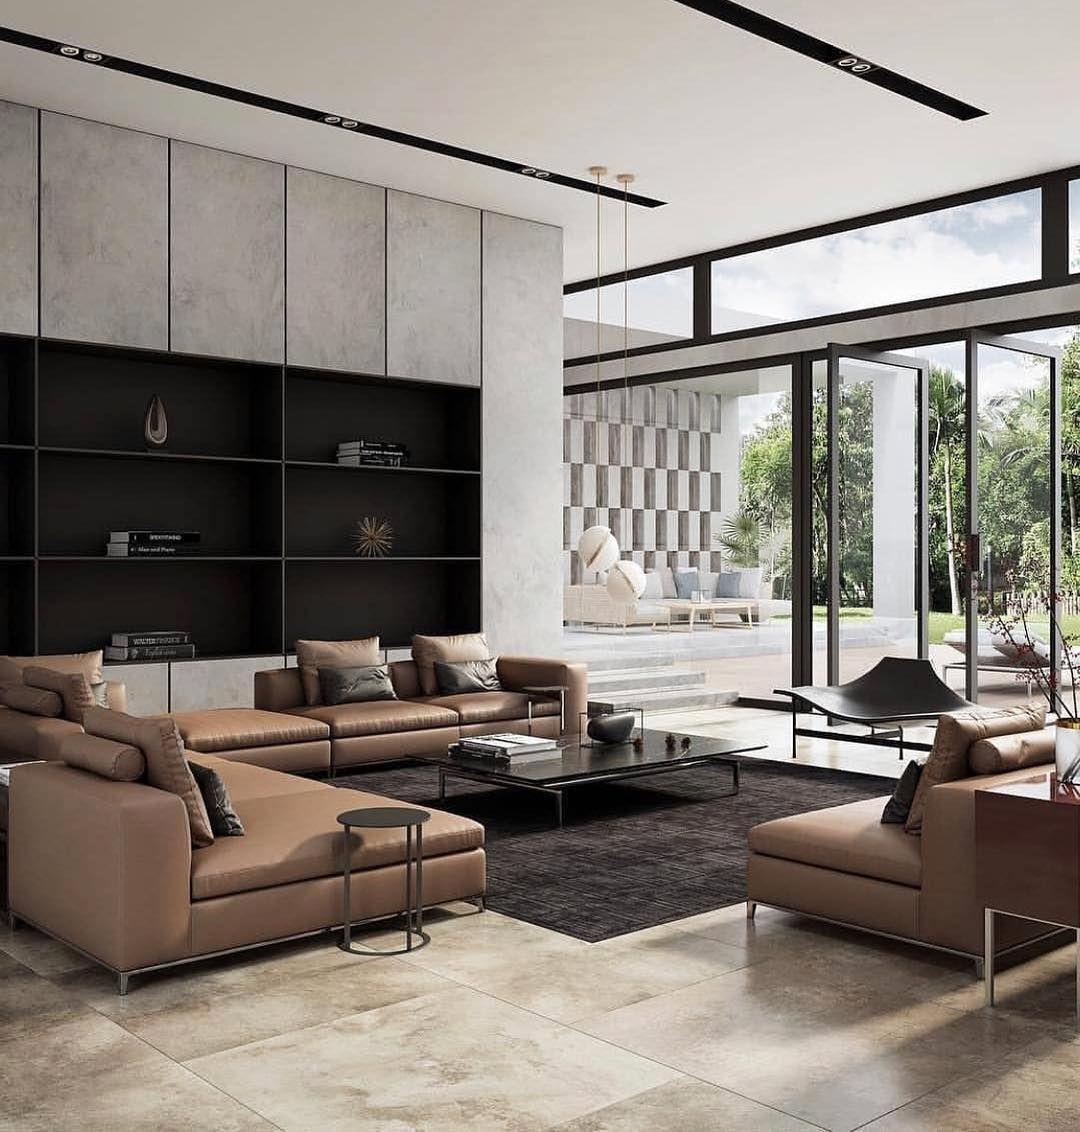 Trendy 19 Best Contemporary Furniture Brand Interior Design Colleges Best Interior Design Modern Interior Design